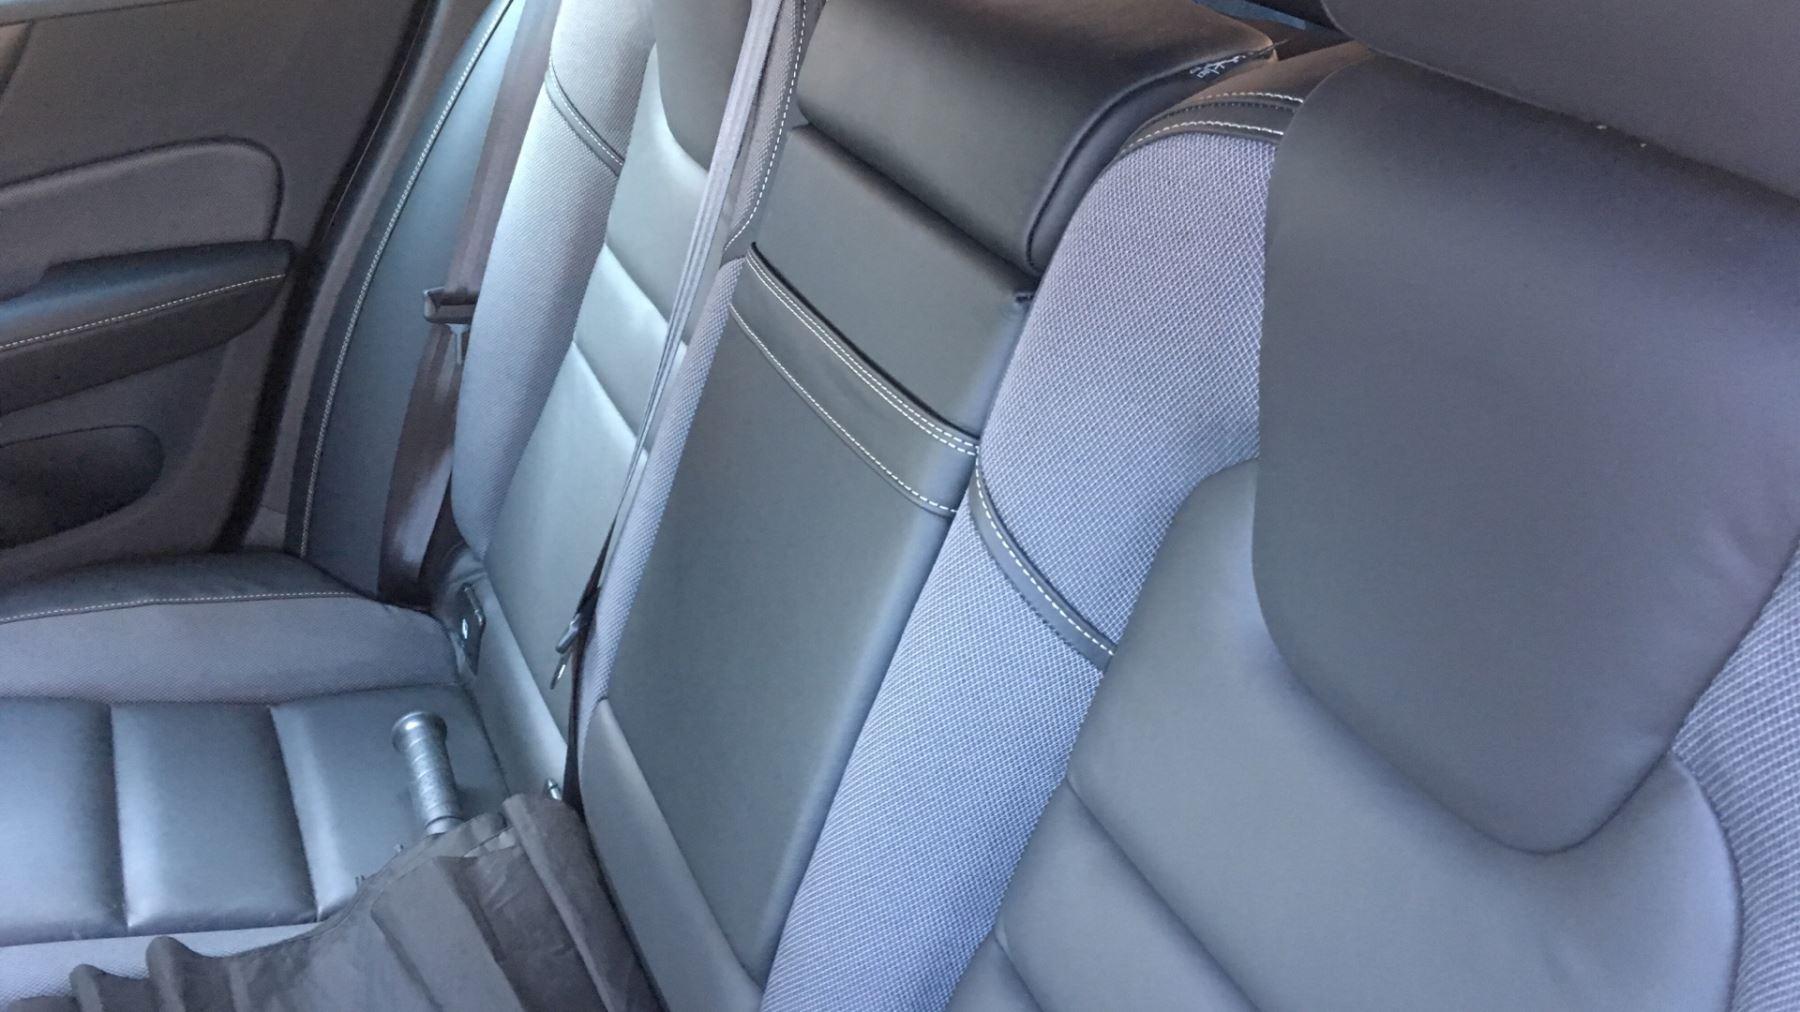 Volvo V60 2.0 D4 [190] R DESIGN 5dr - Volvo on Call, DAB Radio, SAT NAV, Park Assist image 10